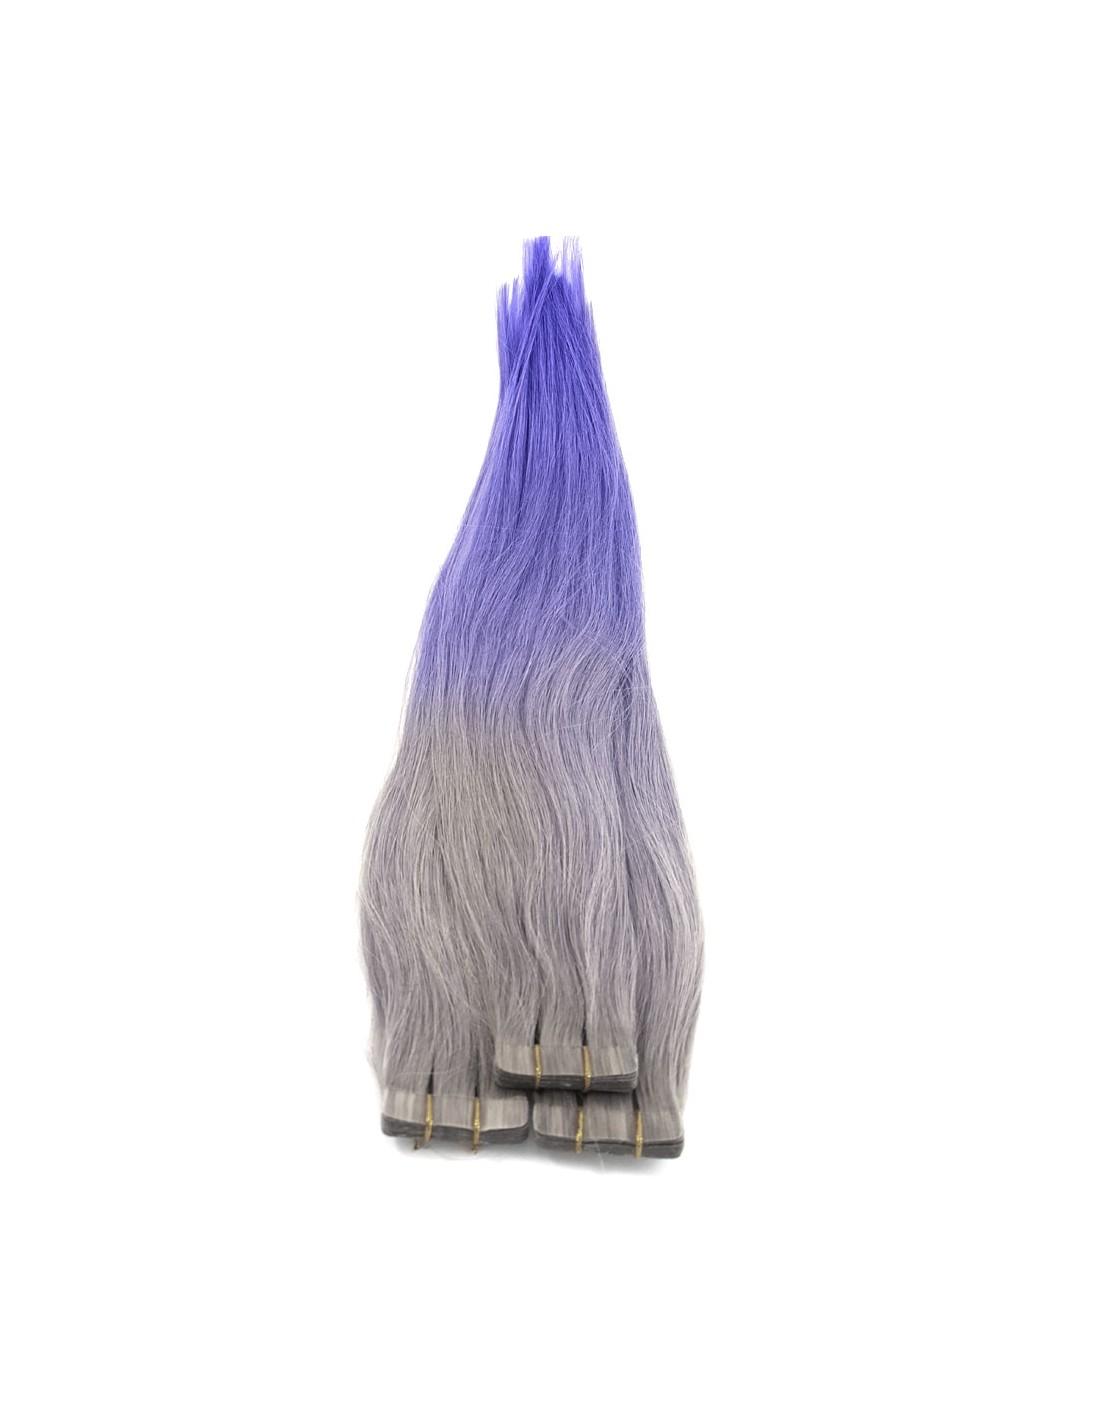 grau tape haarverl ngerung echthaar ombr hair extens hair. Black Bedroom Furniture Sets. Home Design Ideas